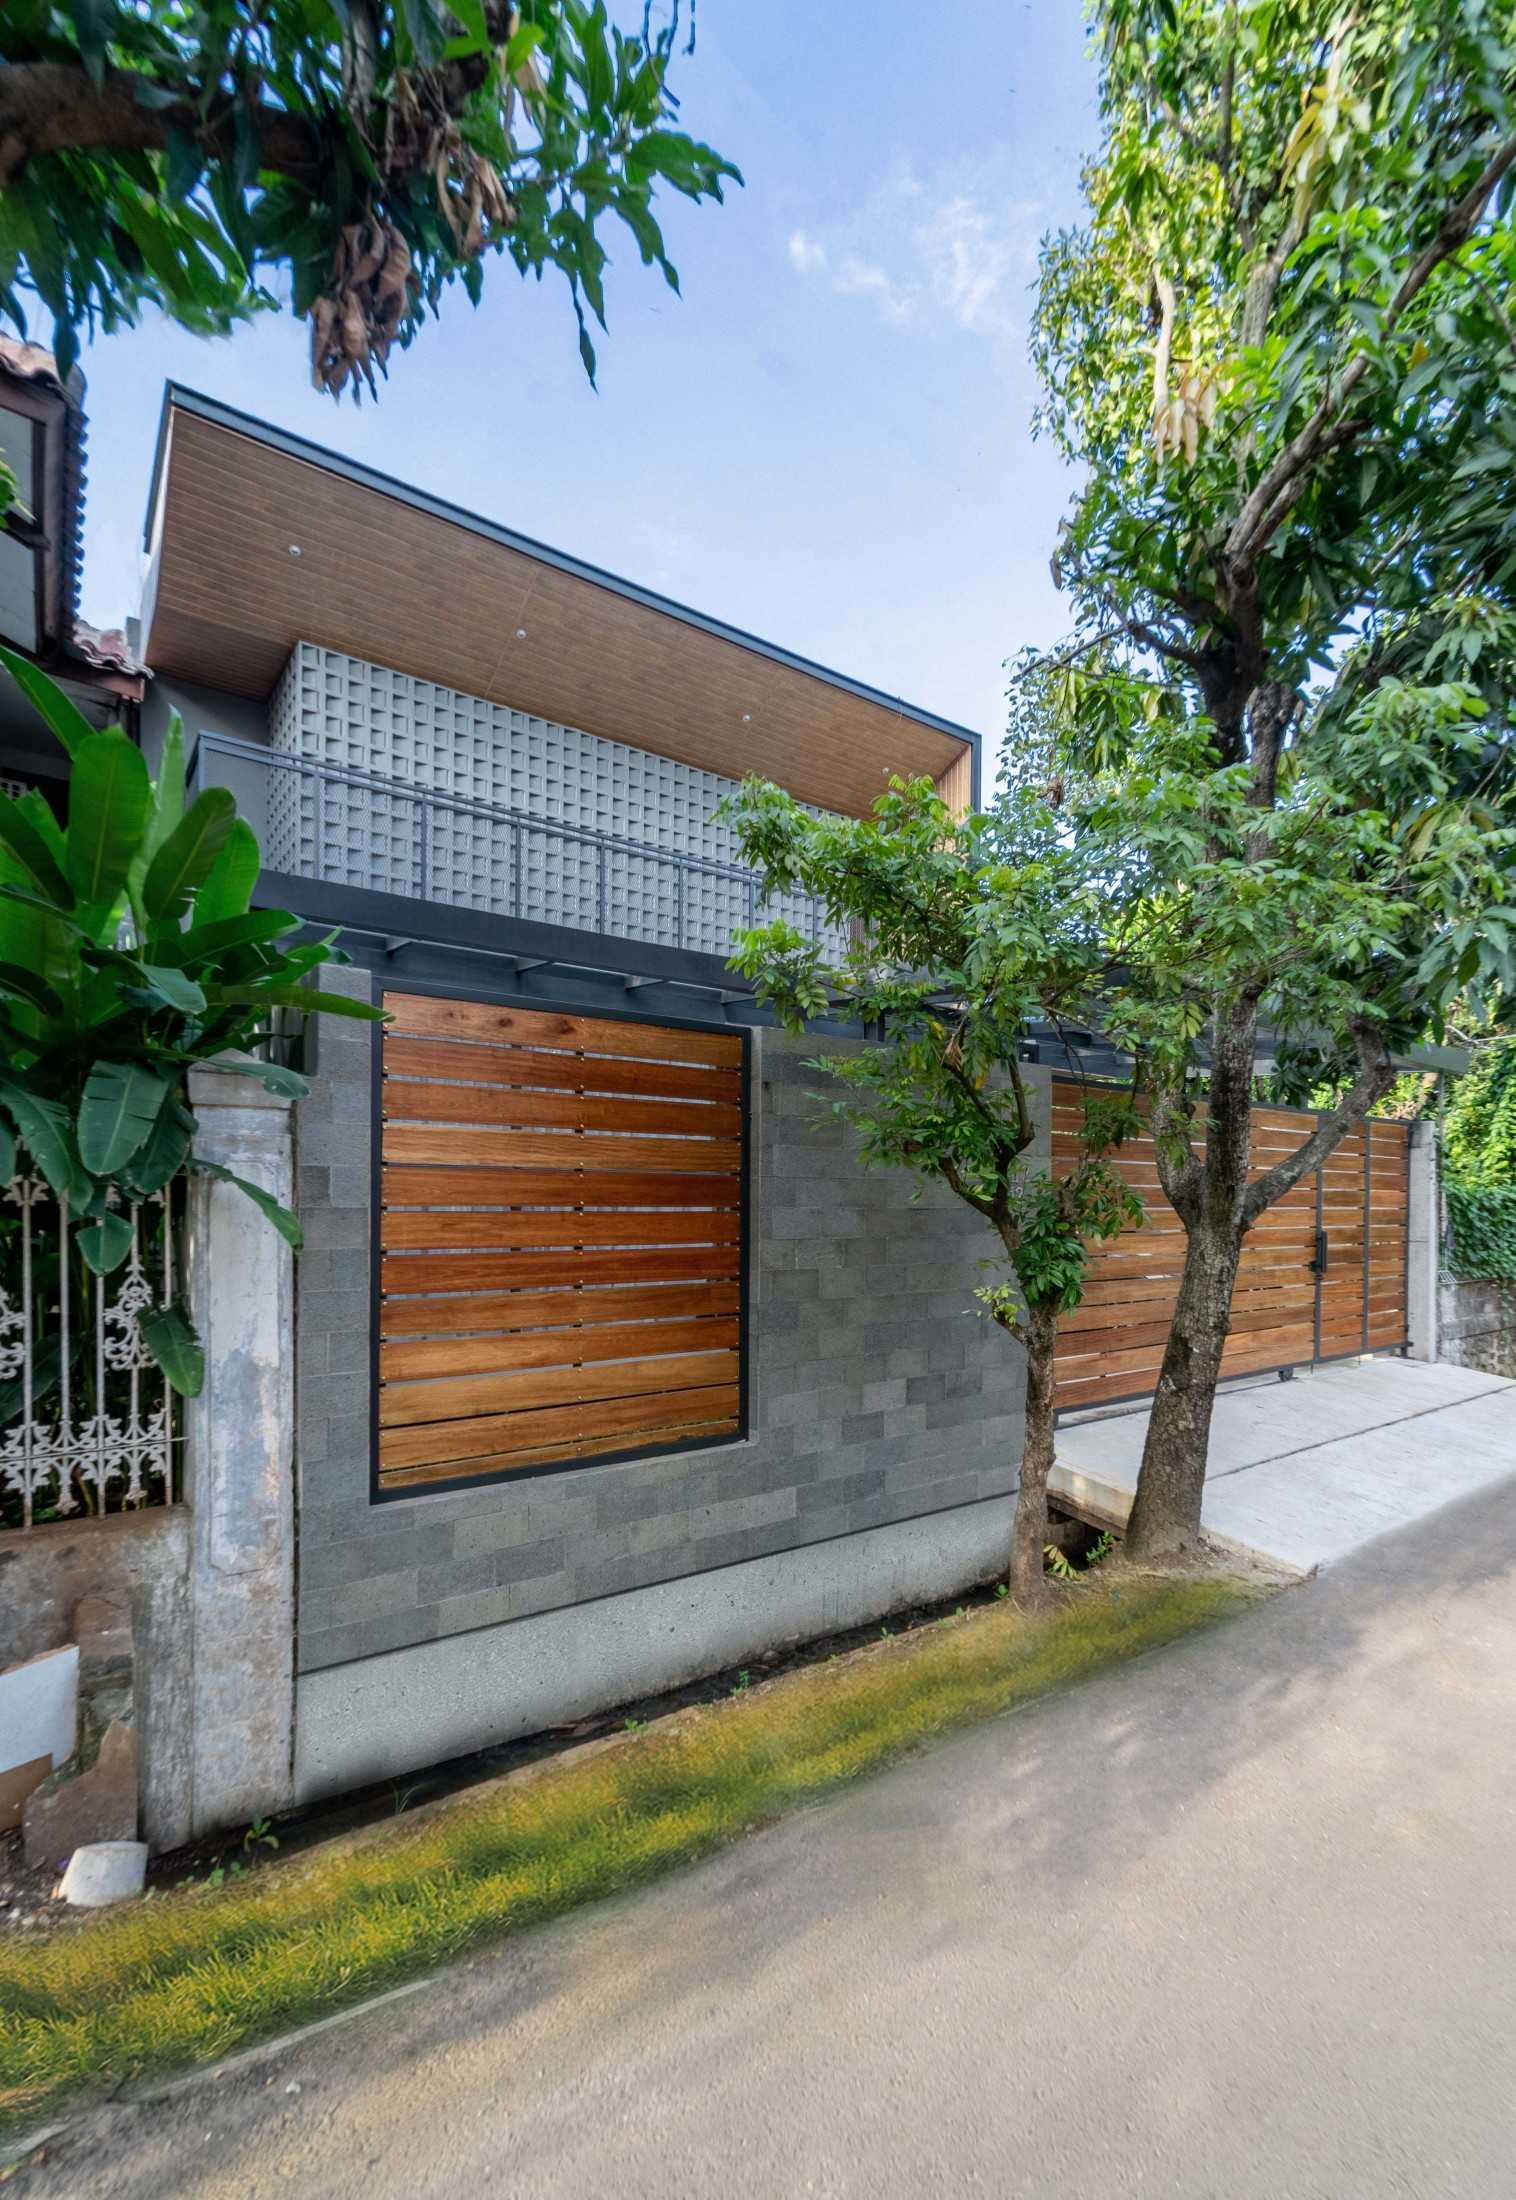 Ruang Raya 3Pm House Jakarta Timur, Kota Jakarta Timur, Daerah Khusus Ibukota Jakarta, Indonesia Jakarta Timur, Kota Jakarta Timur, Daerah Khusus Ibukota Jakarta, Indonesia Ruang-Raya-3Pm-House  122400